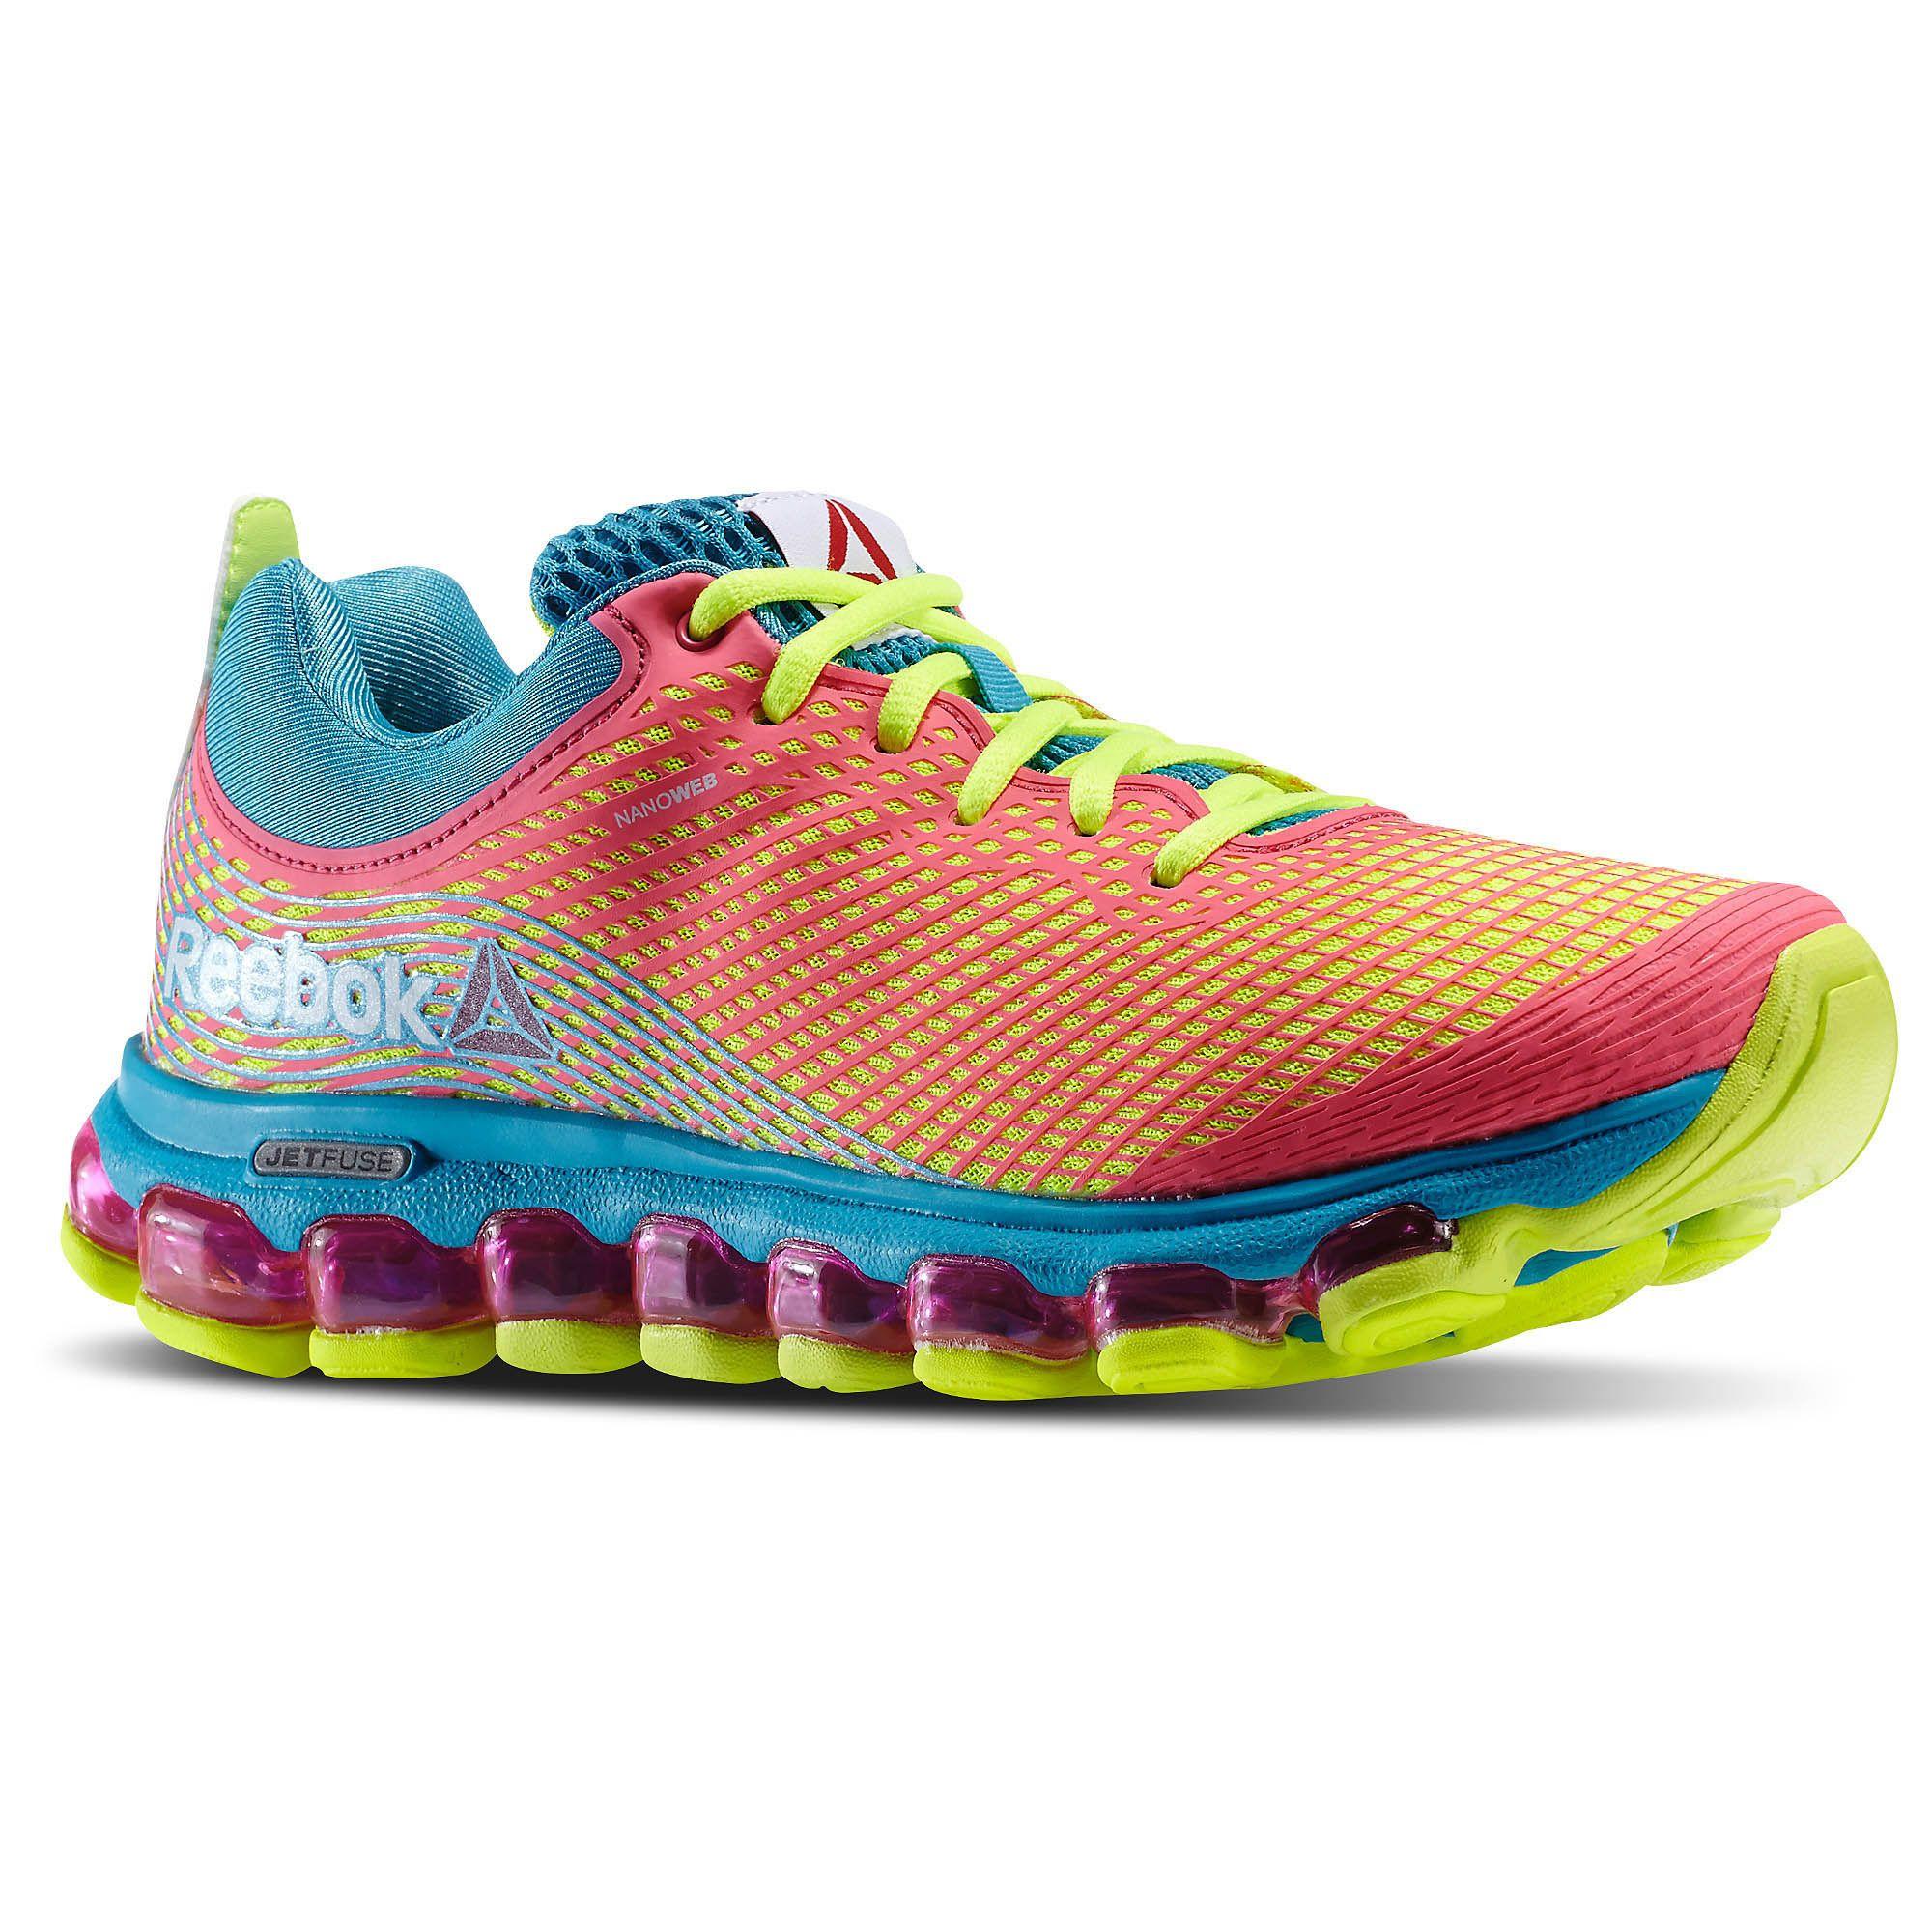 ... reebok women s jetfuse running shoe Reebok Jetfuse Run Black Shoes ... 3f17585ad